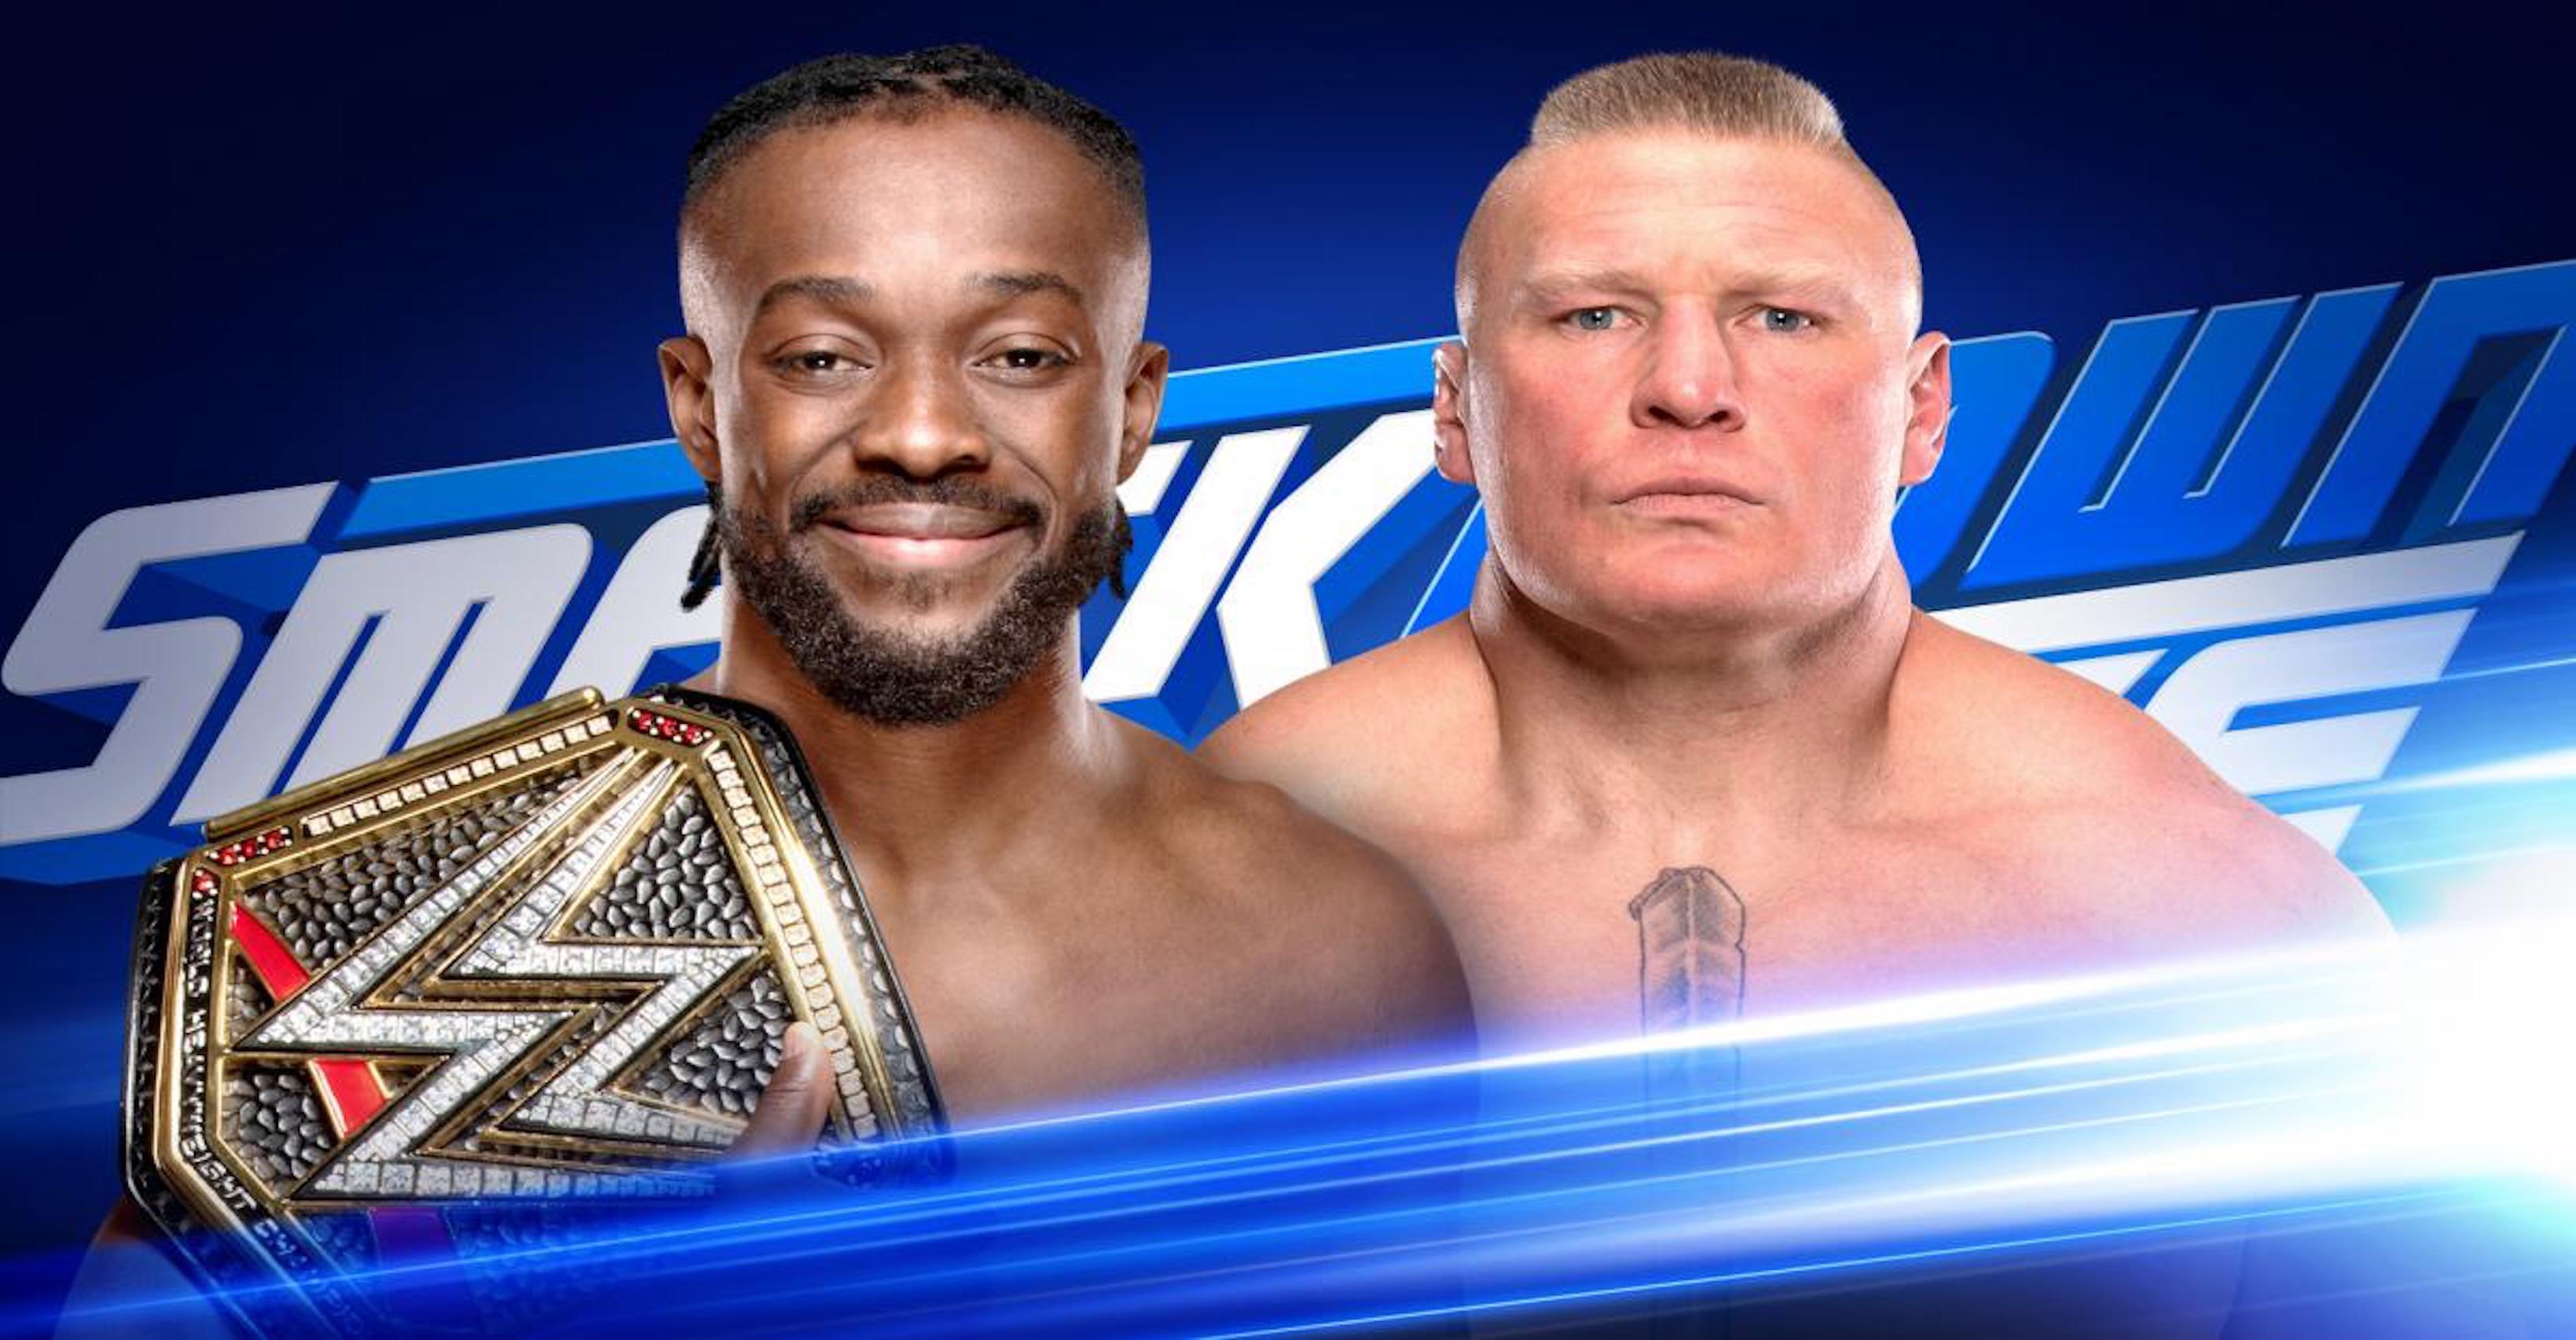 Kofi Kingston To Defend WWE Title Vs. Brock Lesnar On SmackDown FOX Debut